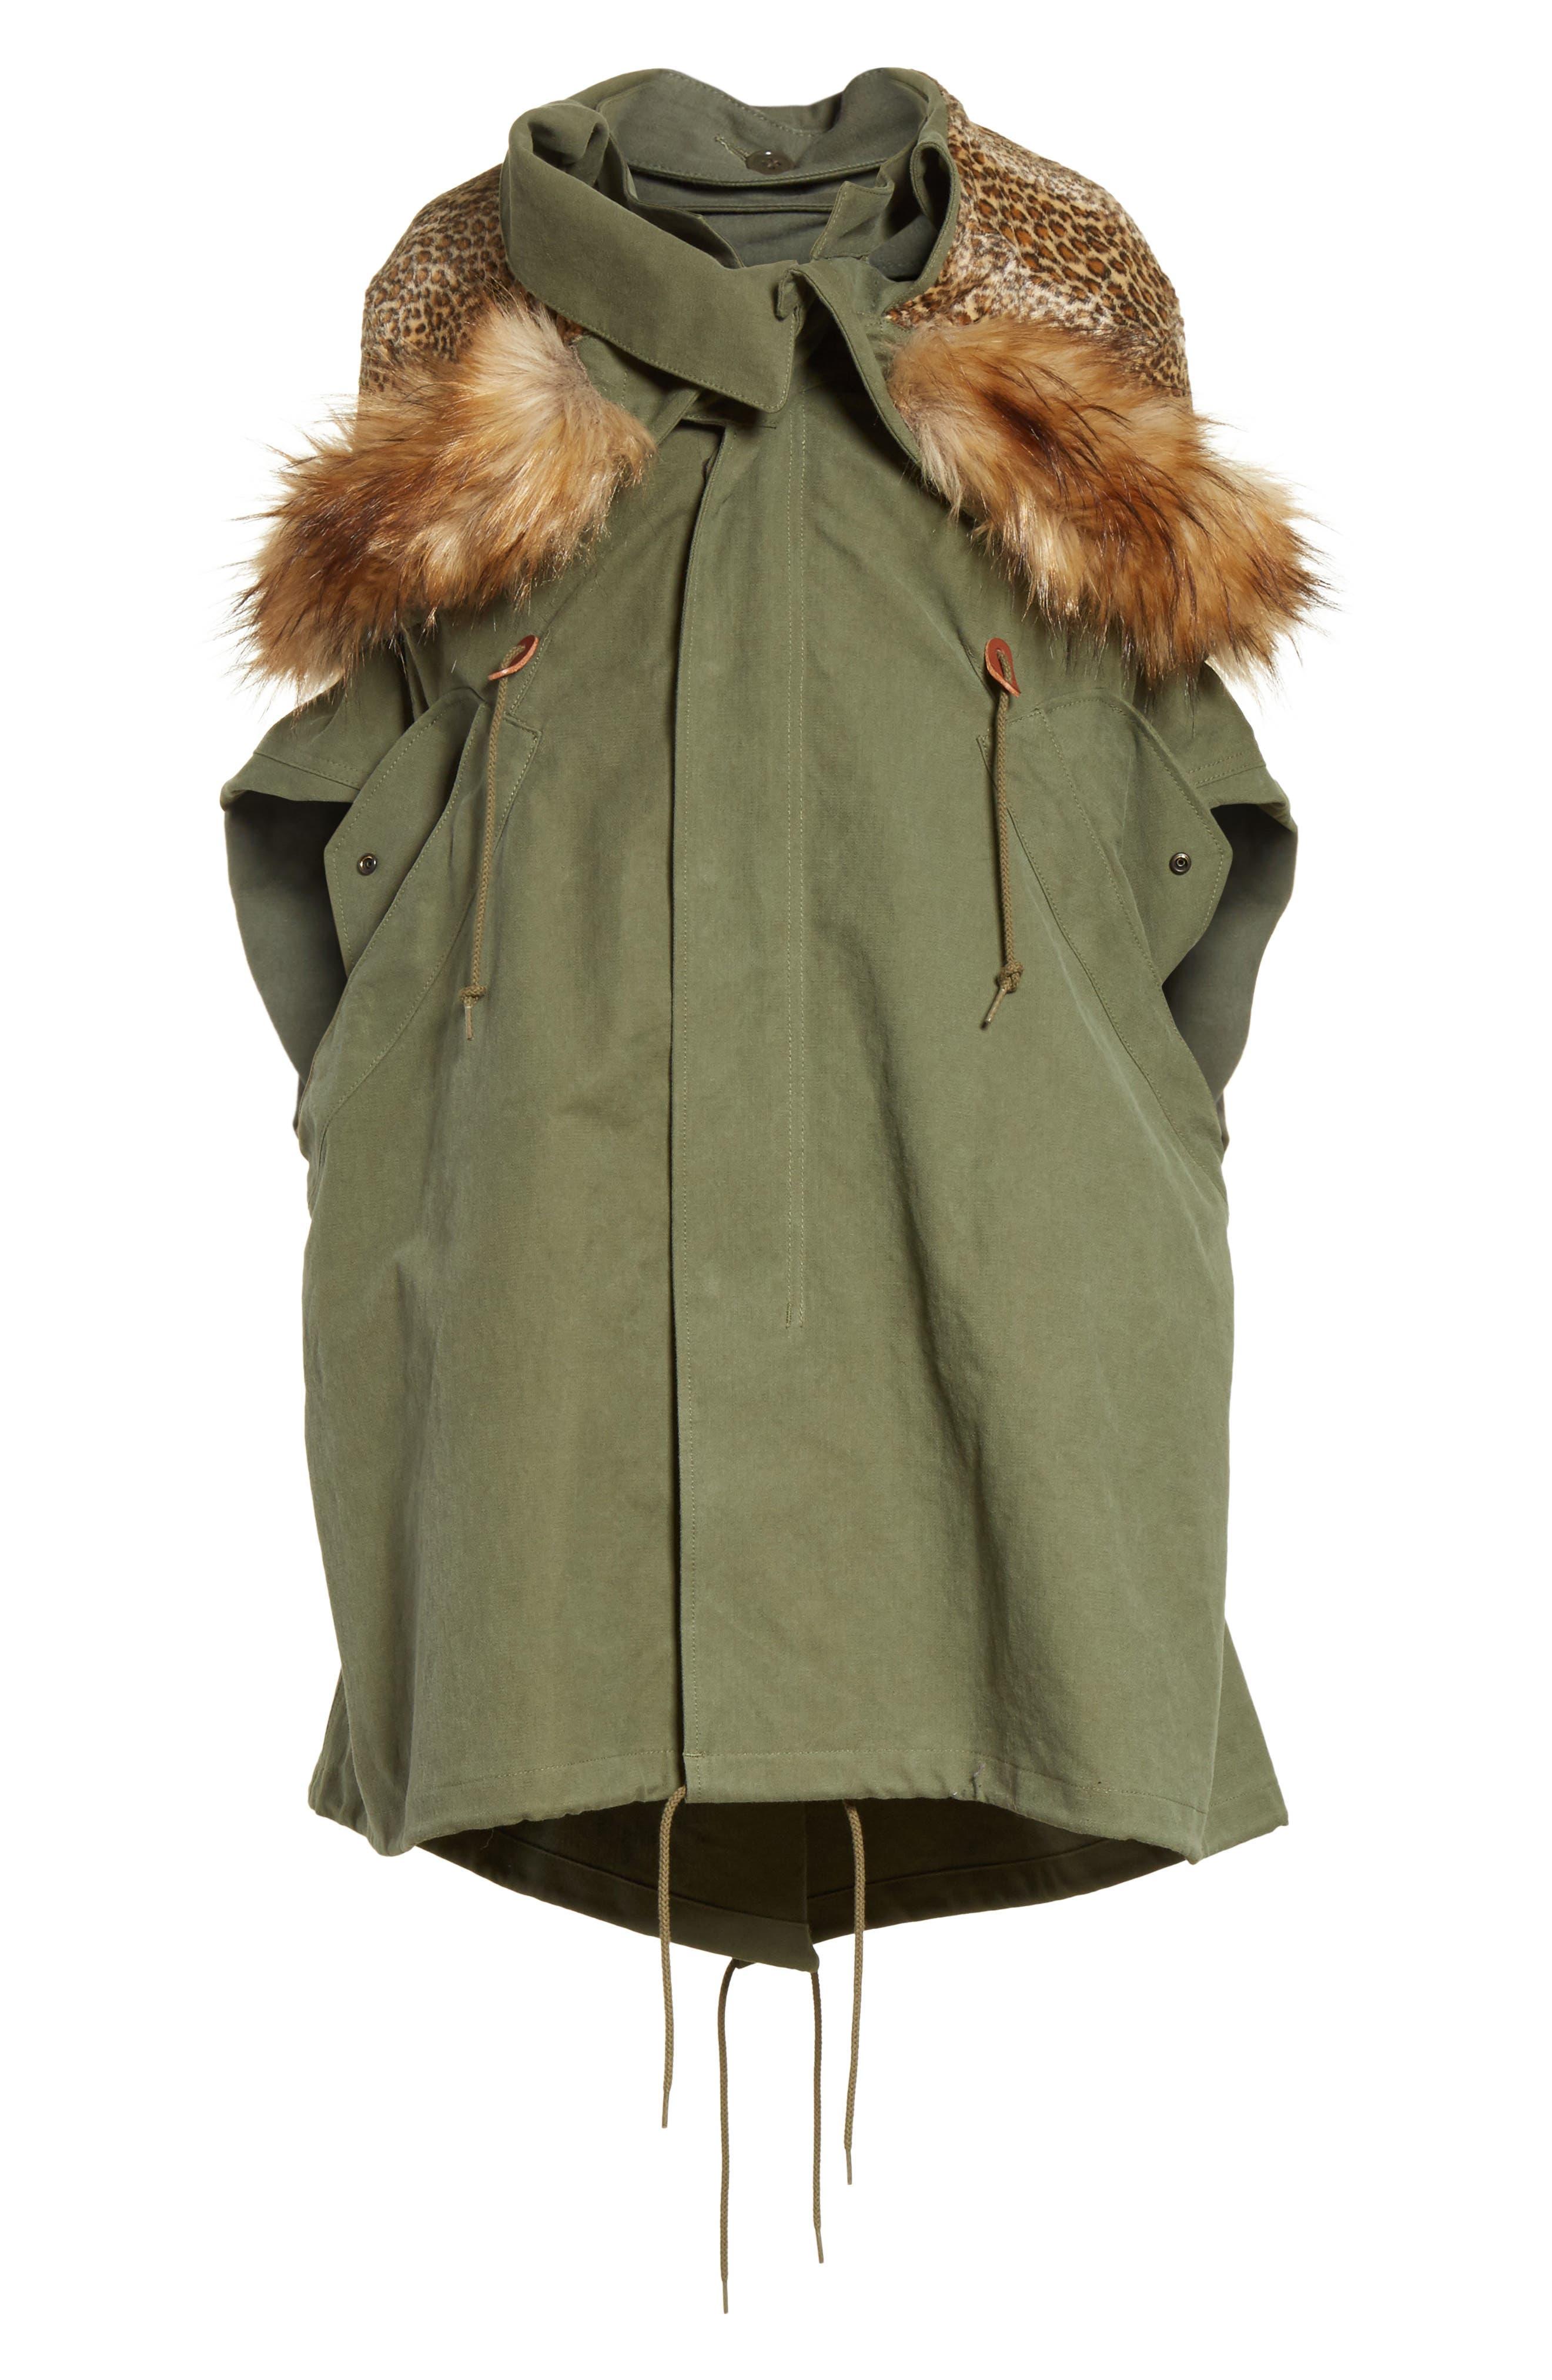 Army Coat with Cheetah Faux Fur Hood,                             Alternate thumbnail 5, color,                             340